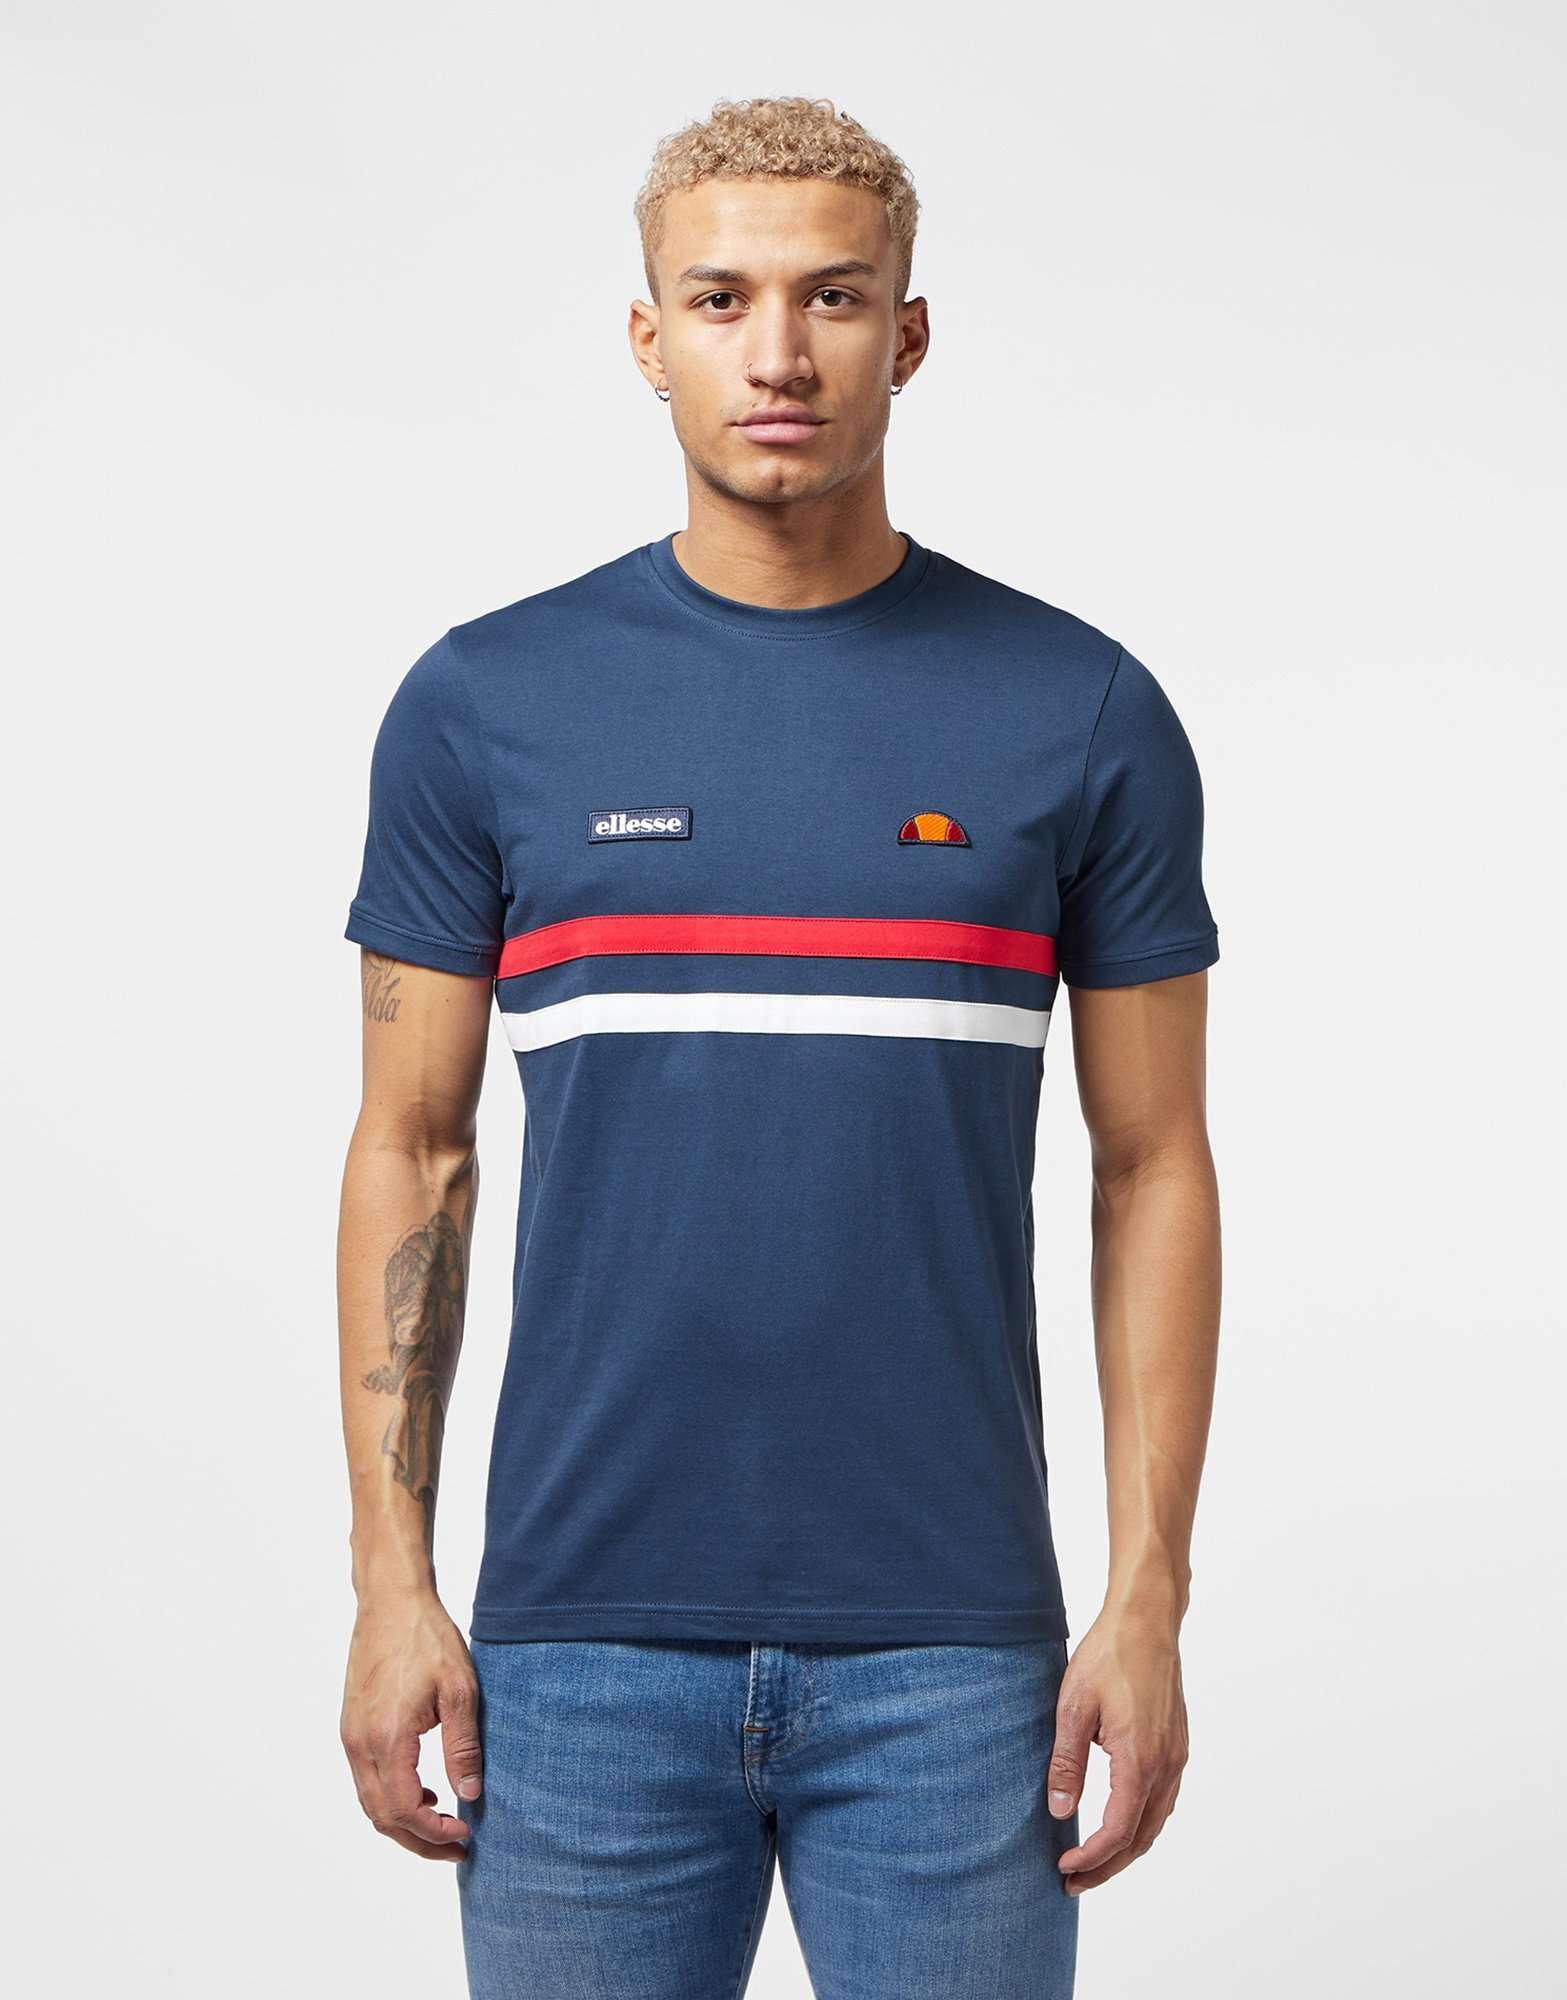 Ellesse Banlo Short Sleeve T-Shirt - Online Exclusive